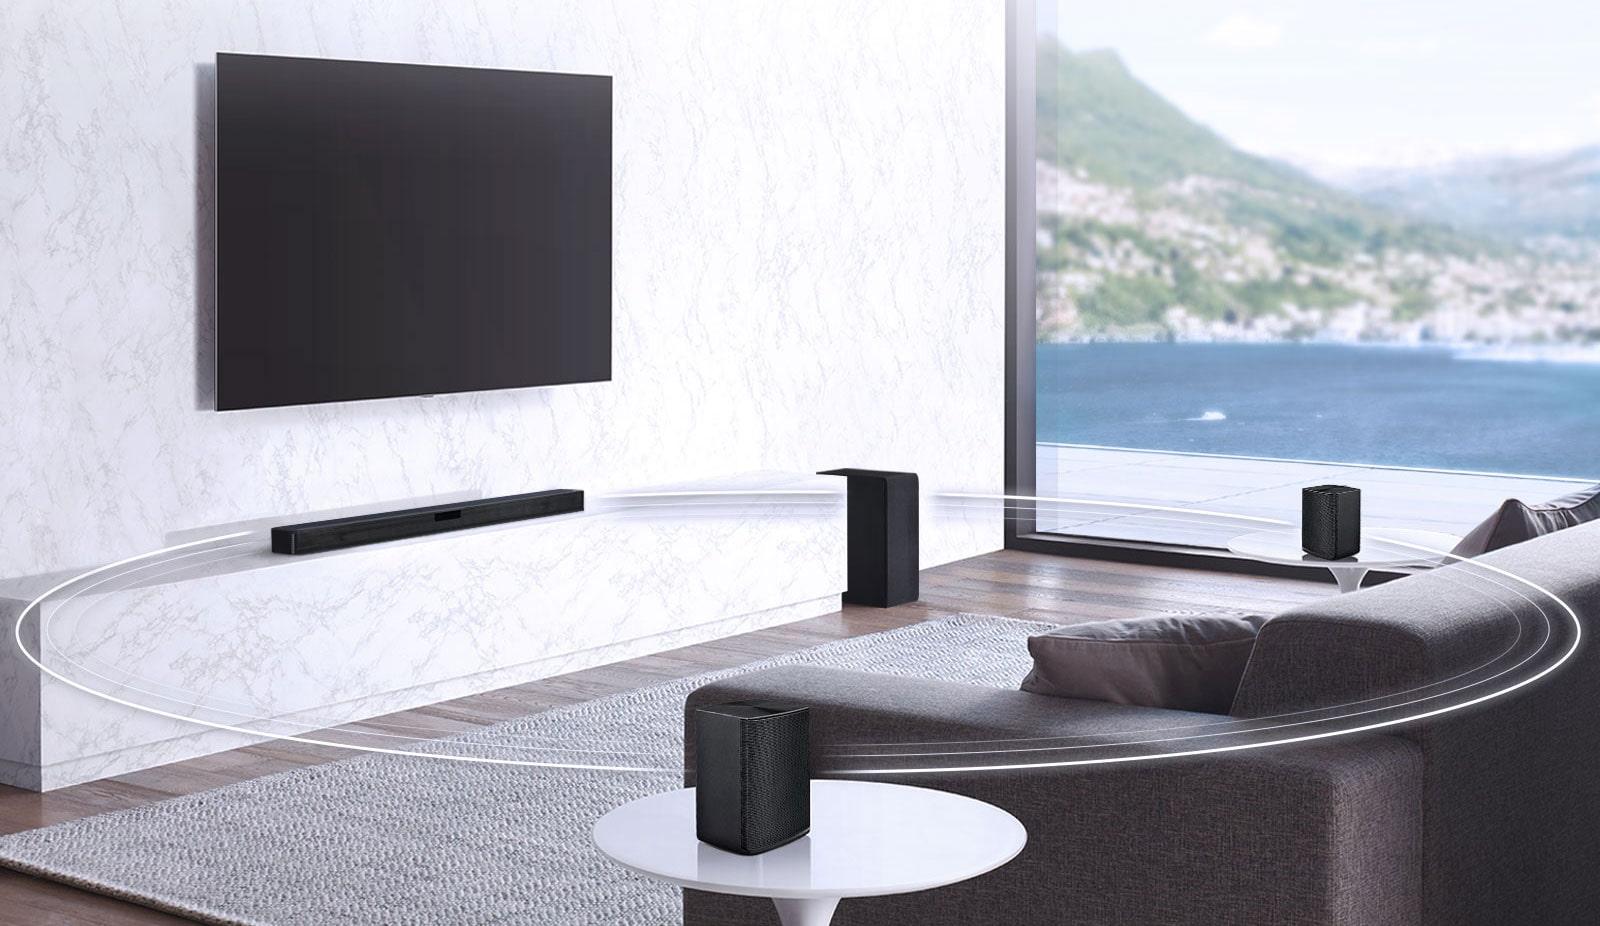 Lg Slm4r 420w Sound Bar W Bluetooth Streaming And Surround Sound Speakers Slm4r Lg Usa